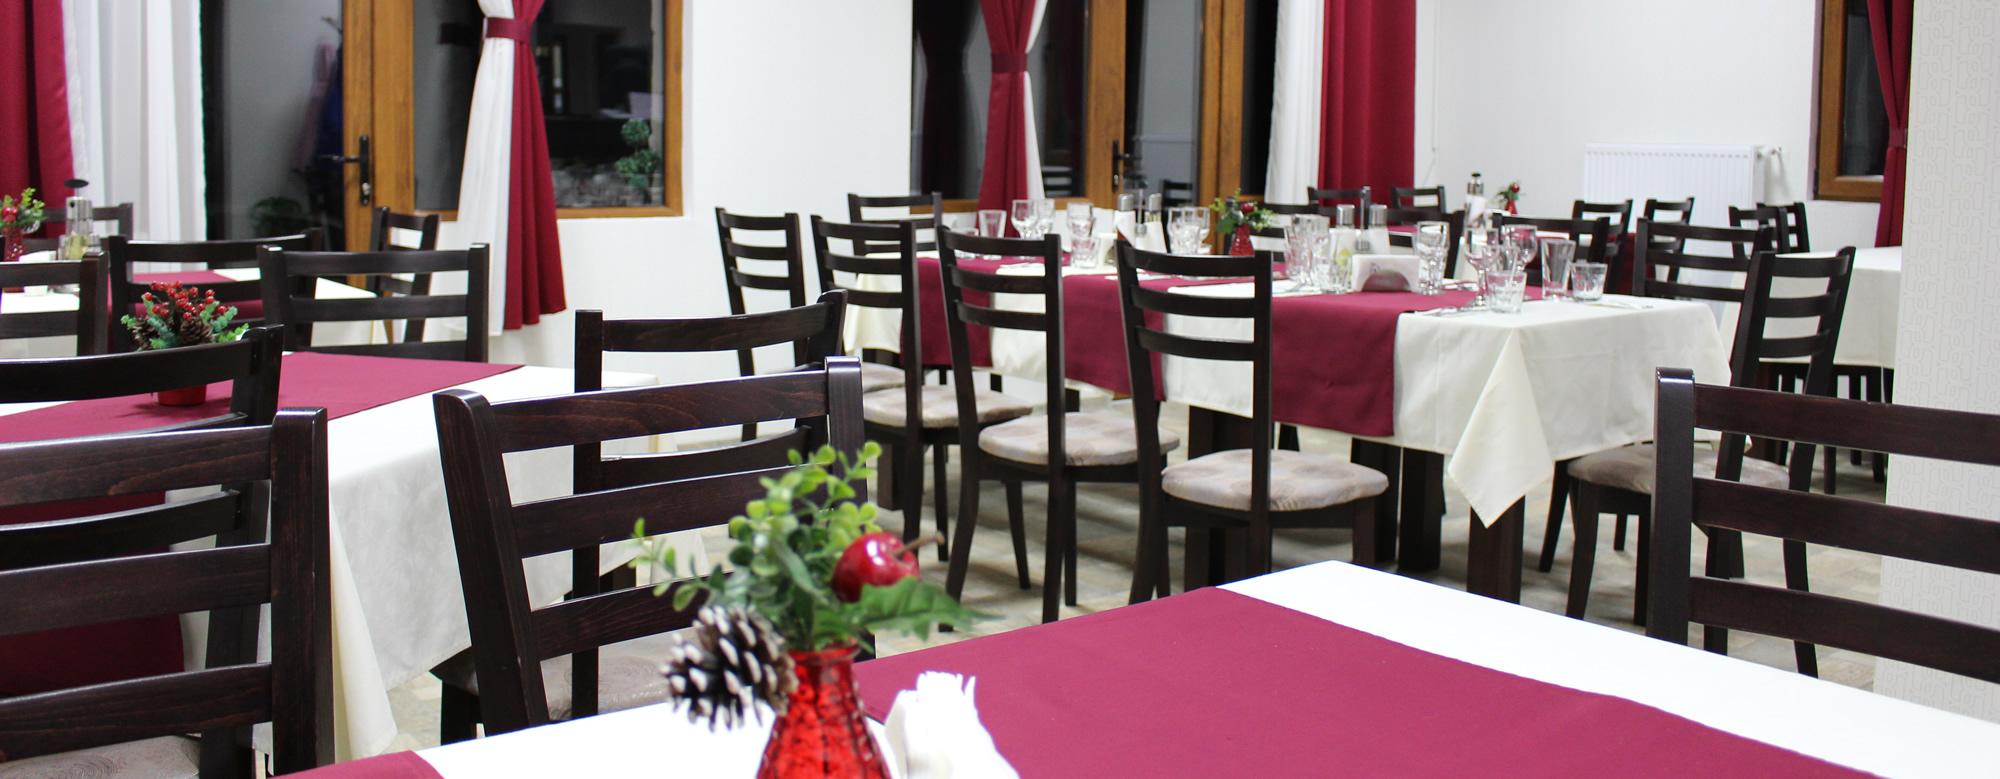 http://complexmagura.com/wp-content/uploads/2016/03/restaurant3.jpg